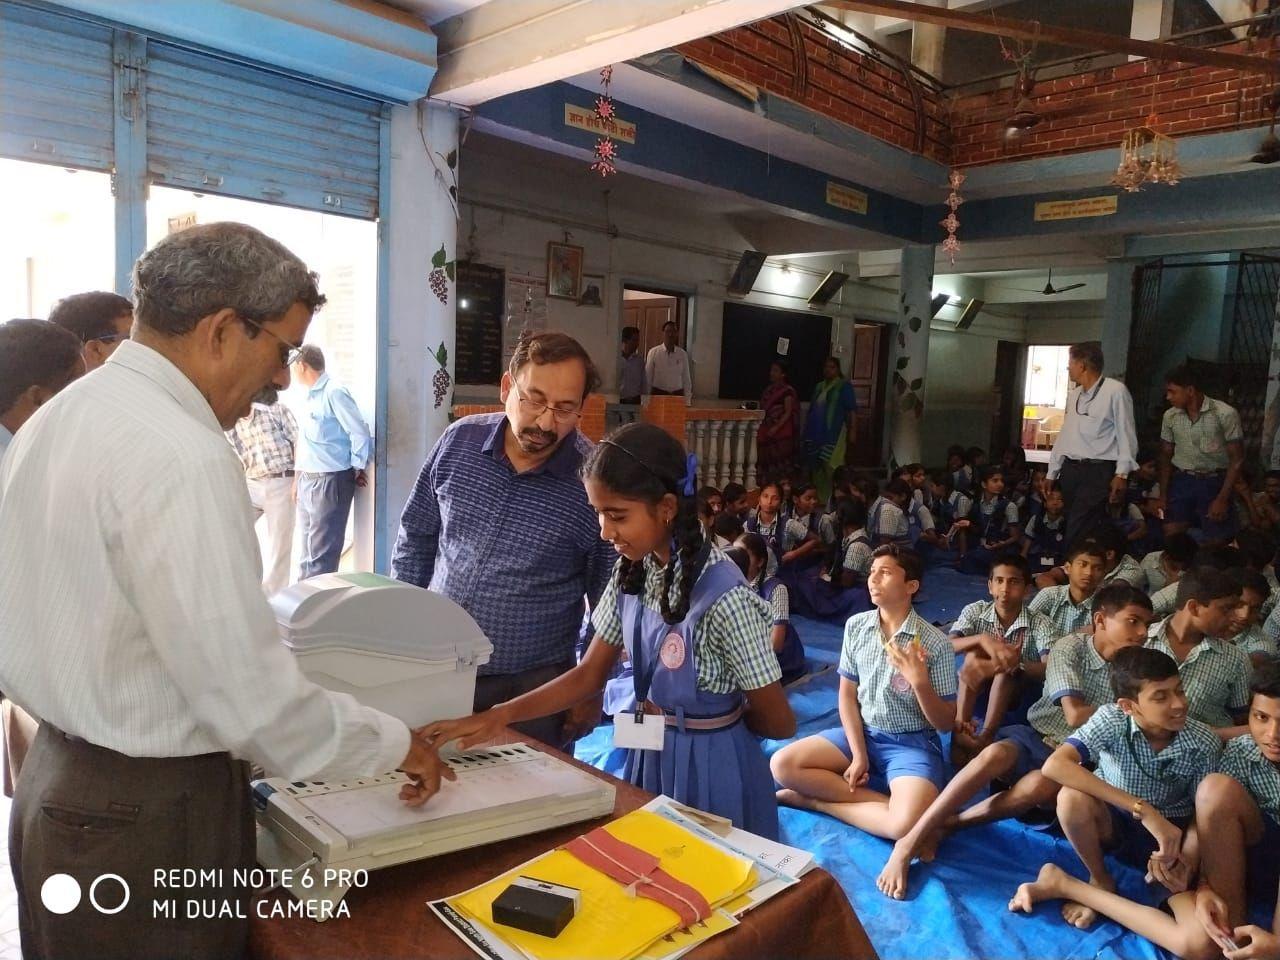 Mat-disha Game conducted by 03 Bicholim A.C at Radhakrishna Vidyalaya Bicholim